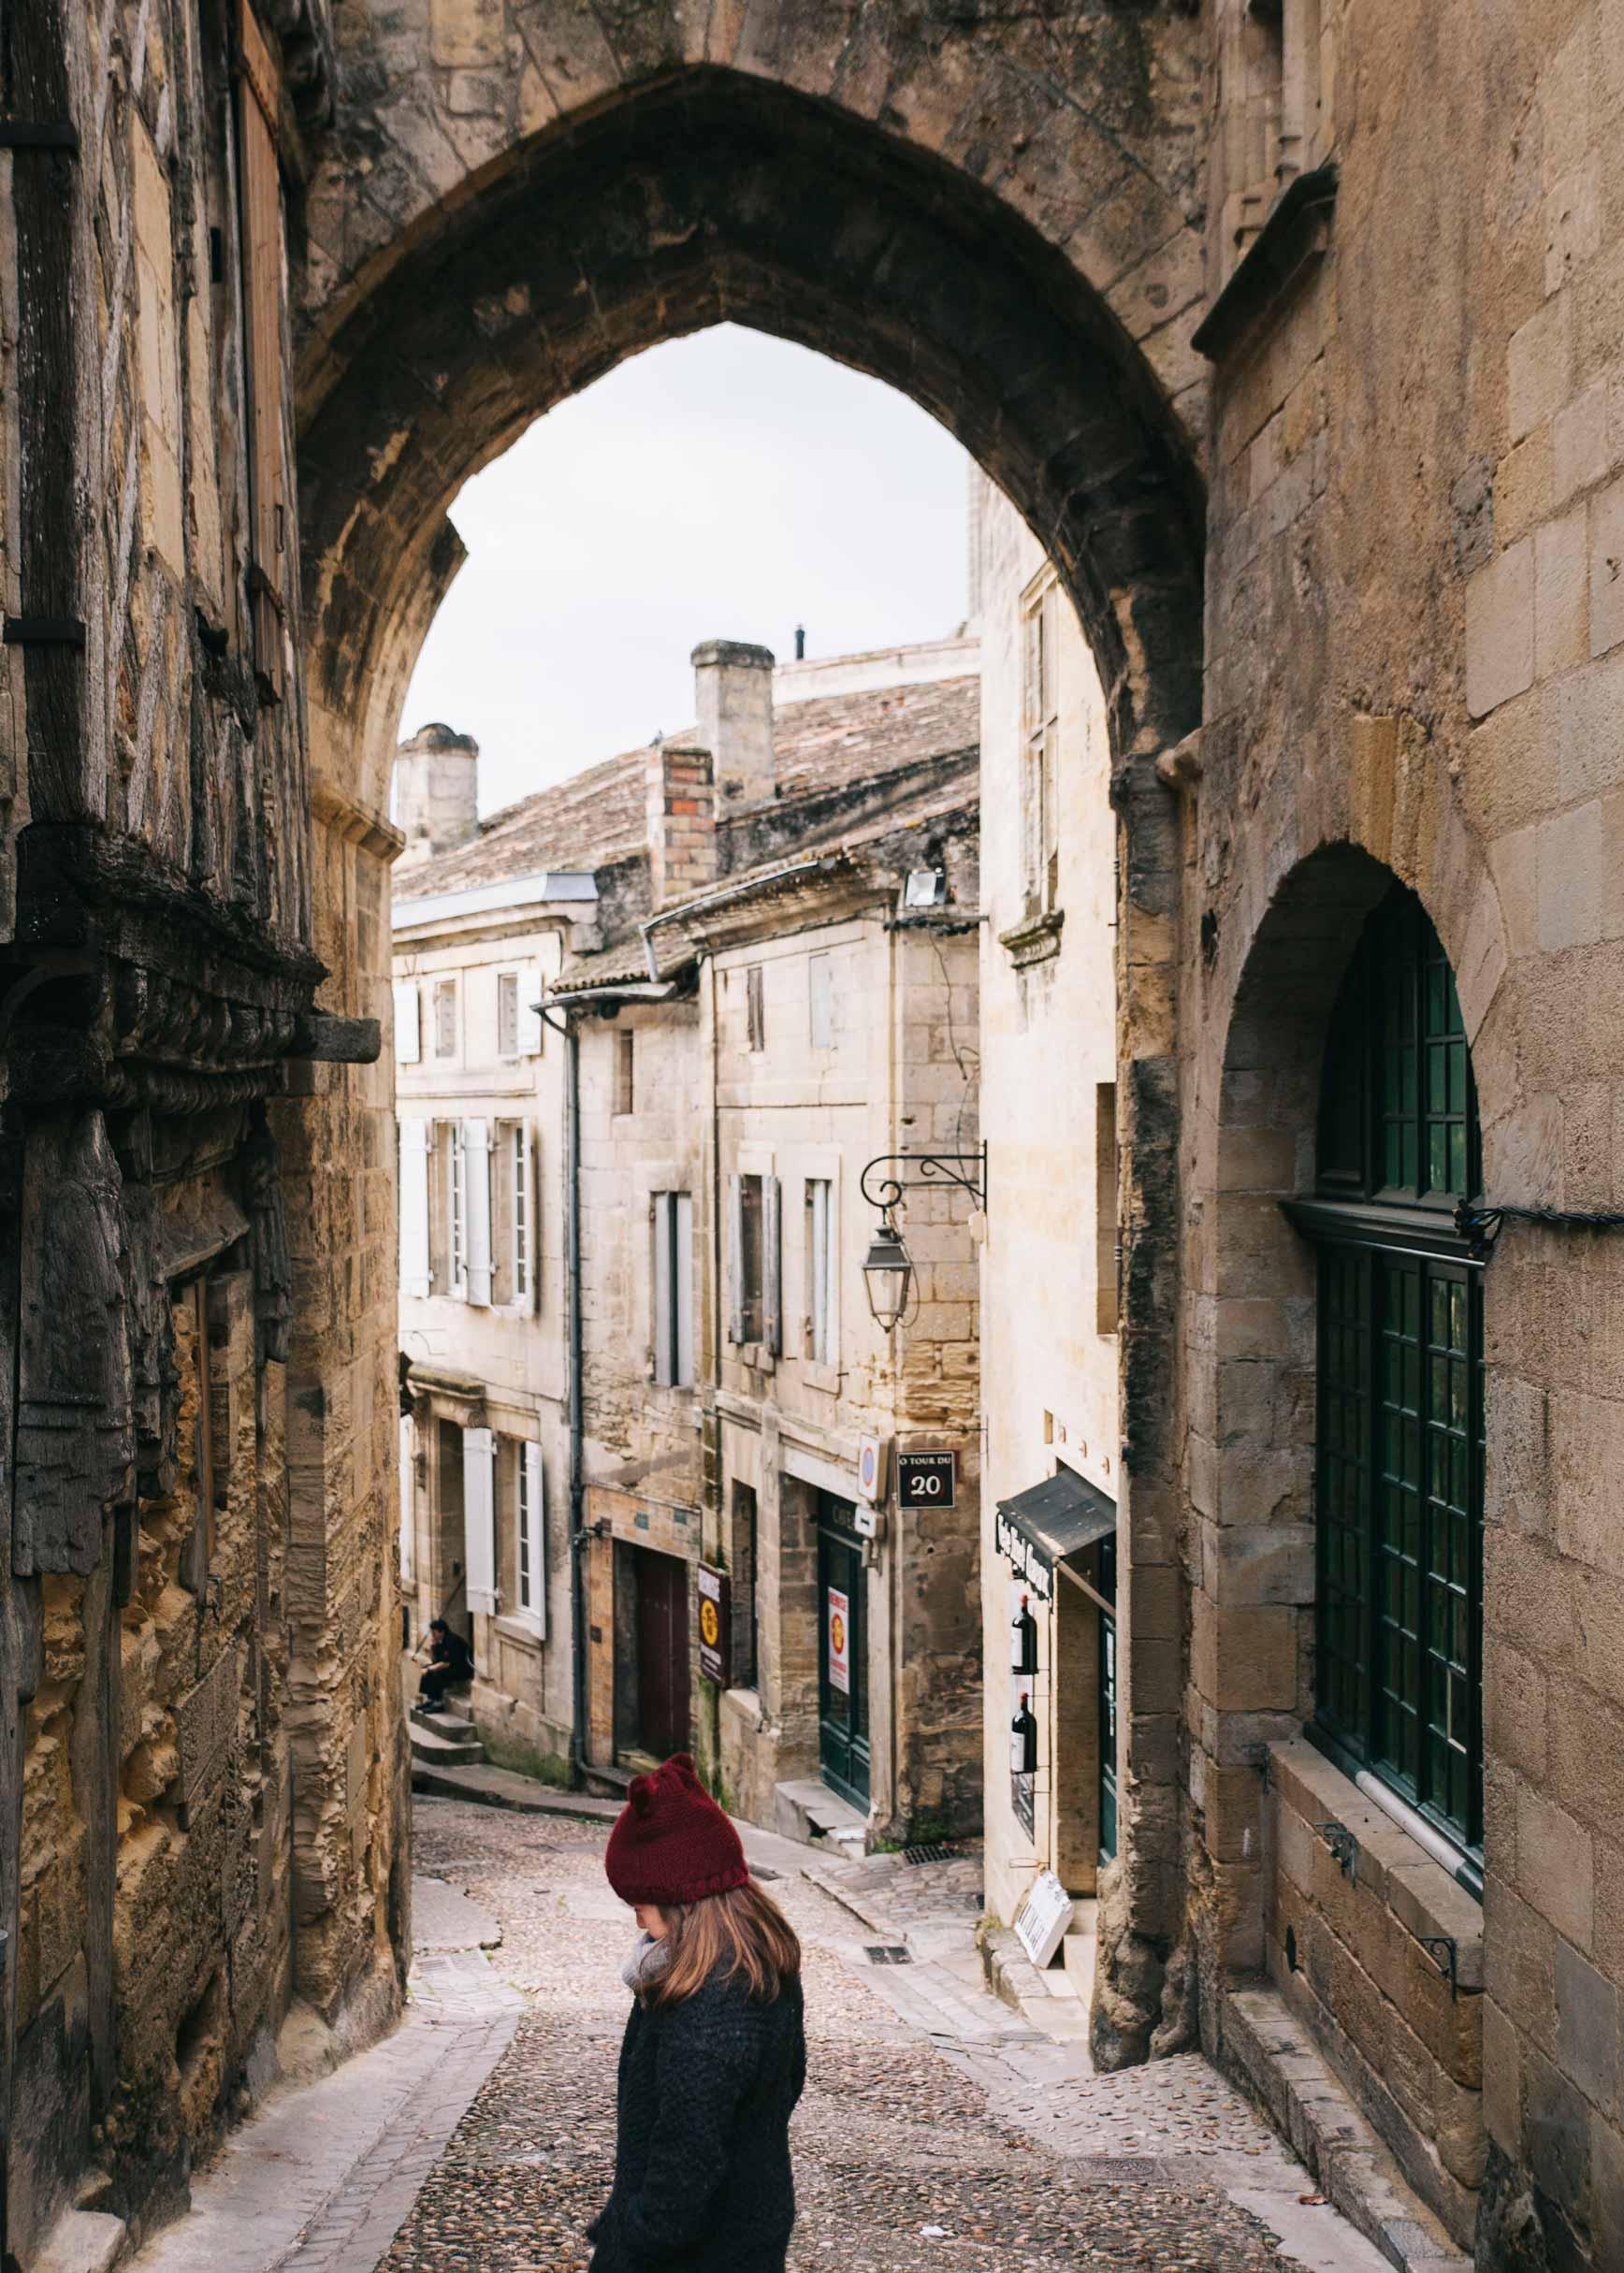 Saint-Emilion con niños: Encanto medieval entre viñedos